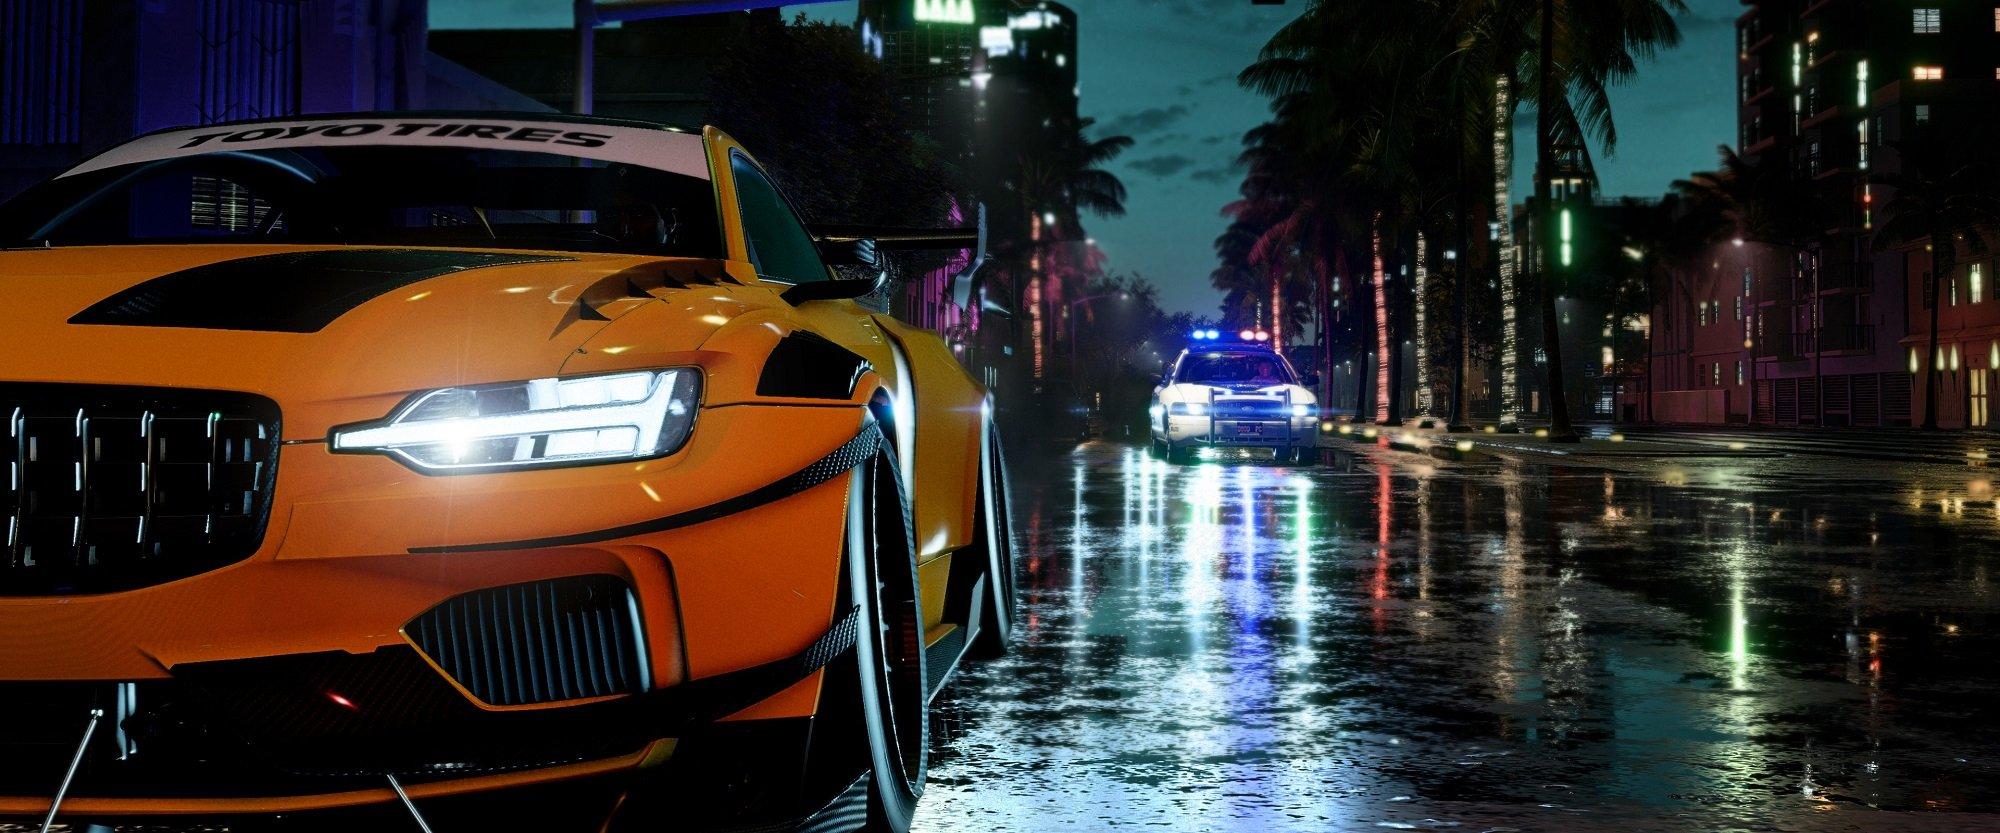 Need for Speed случайные обзоры